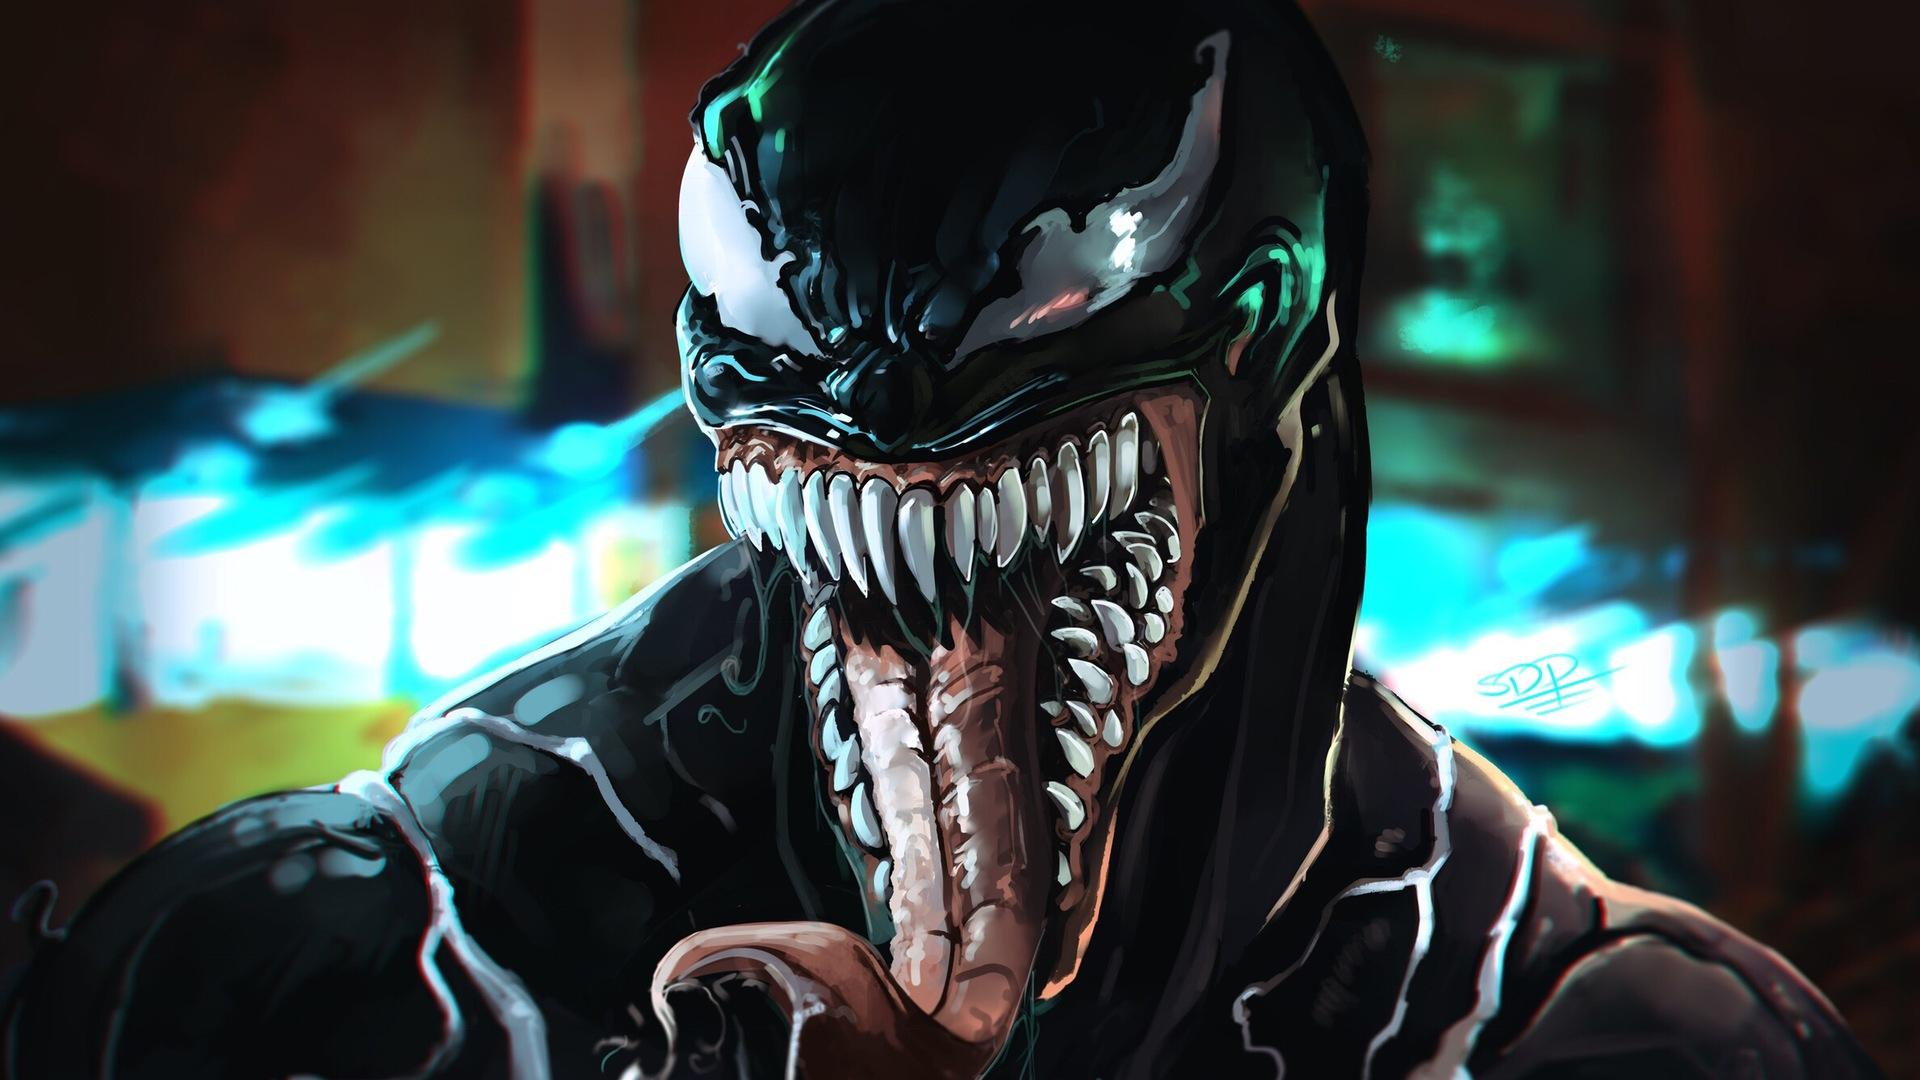 Venom wallpaper 1080p